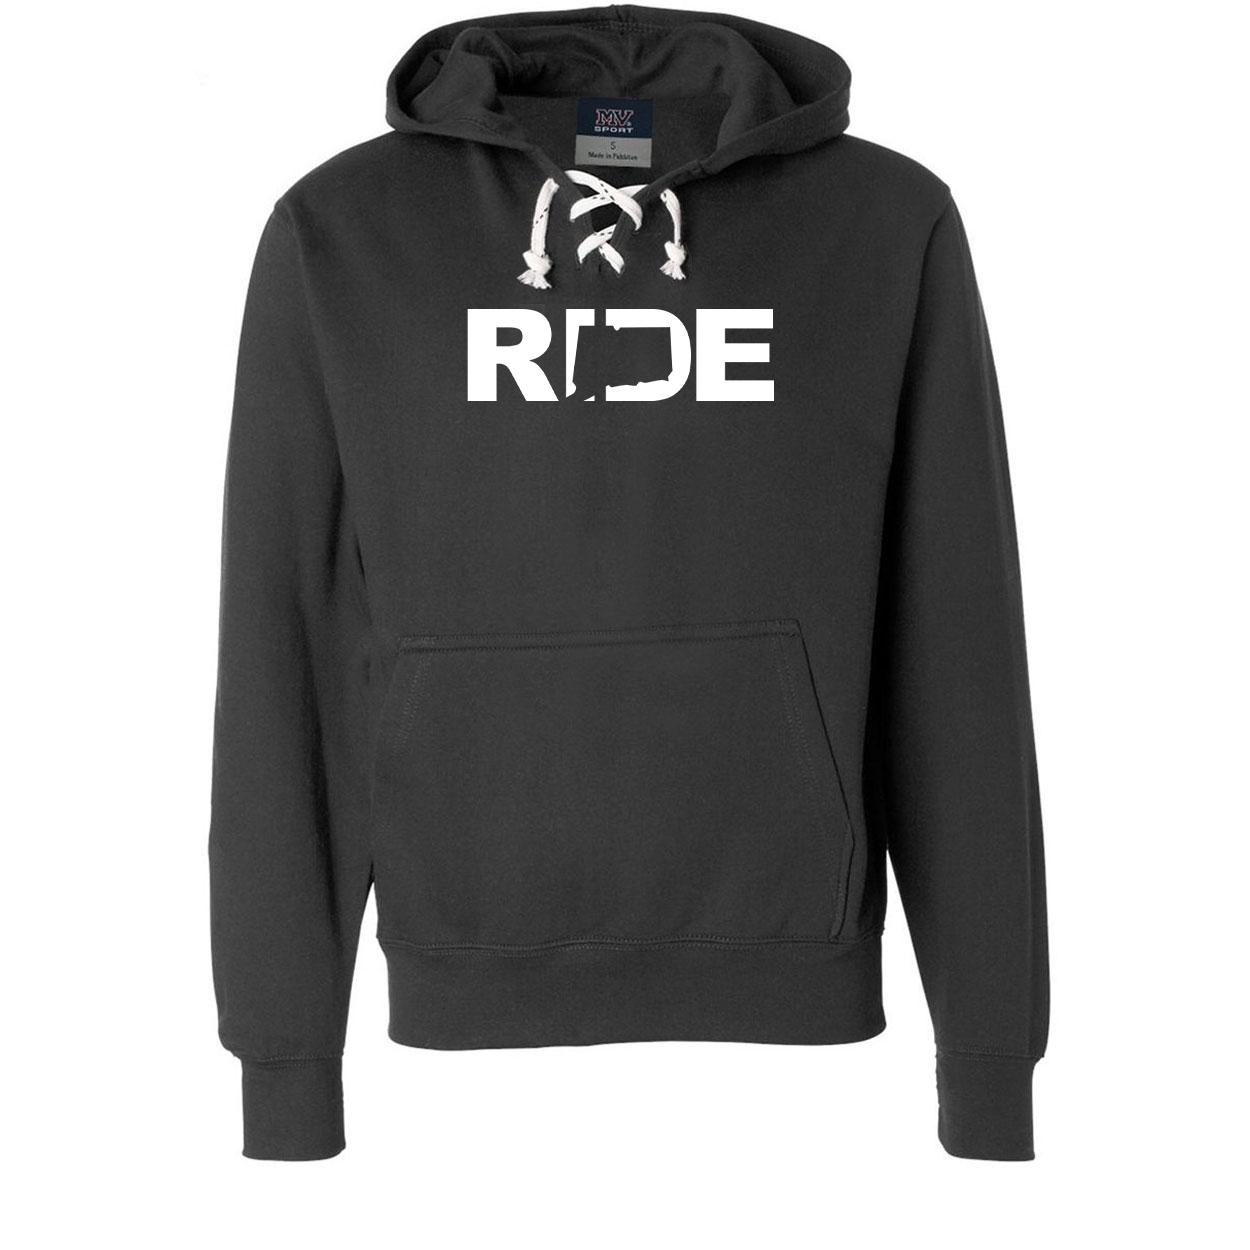 Ride Connecticut Classic Unisex Premium Hockey Sweatshirt Black (White Logo)